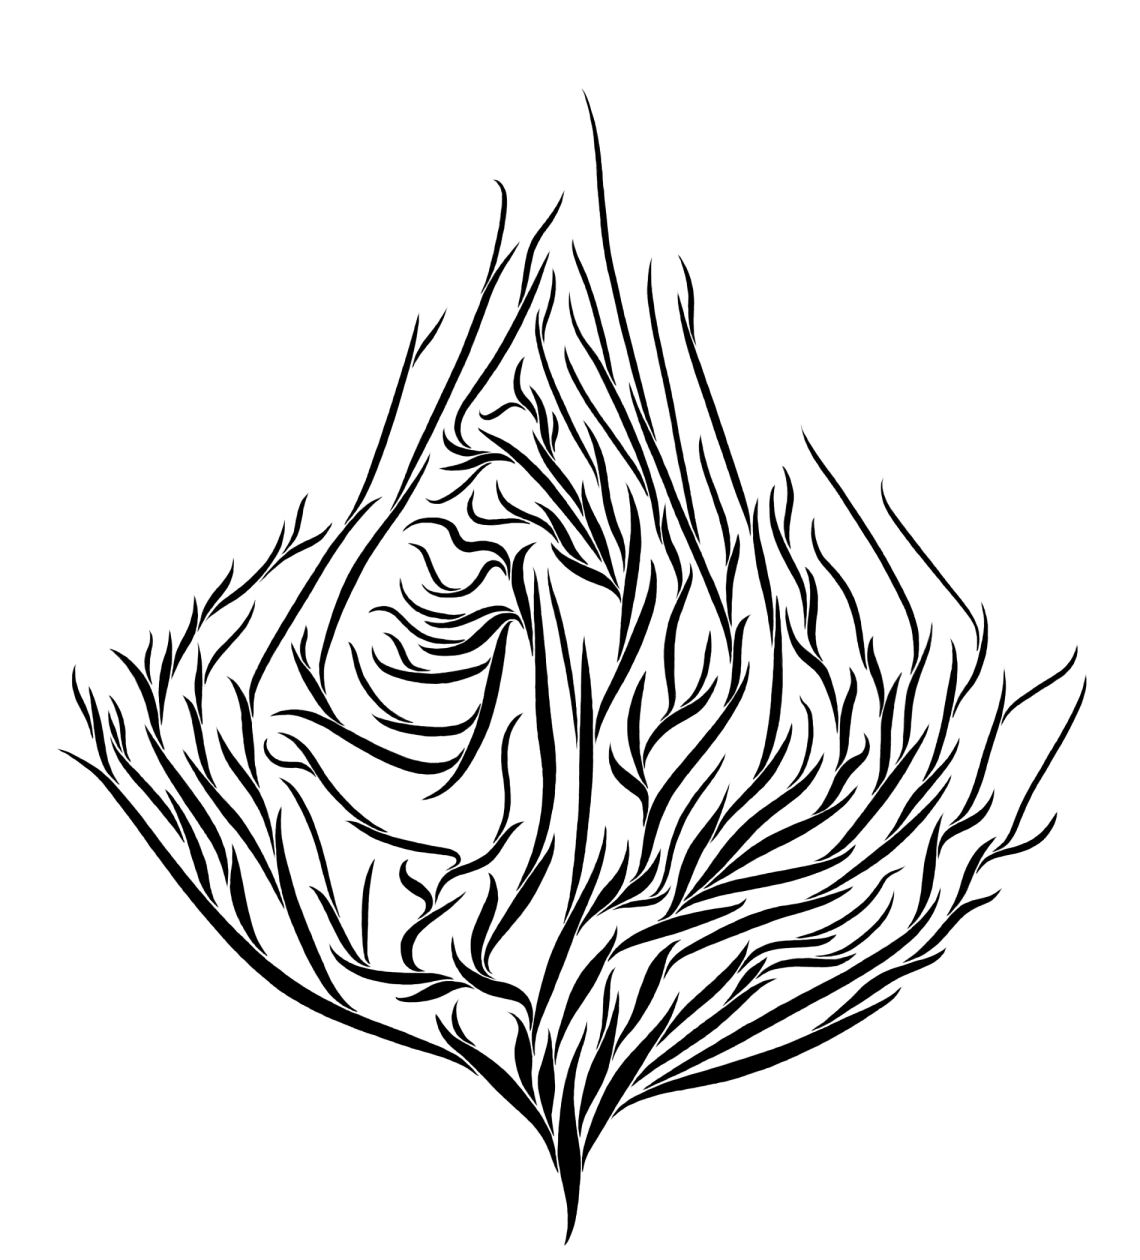 Line Art Leaves : Line drawings of leaves clipart best